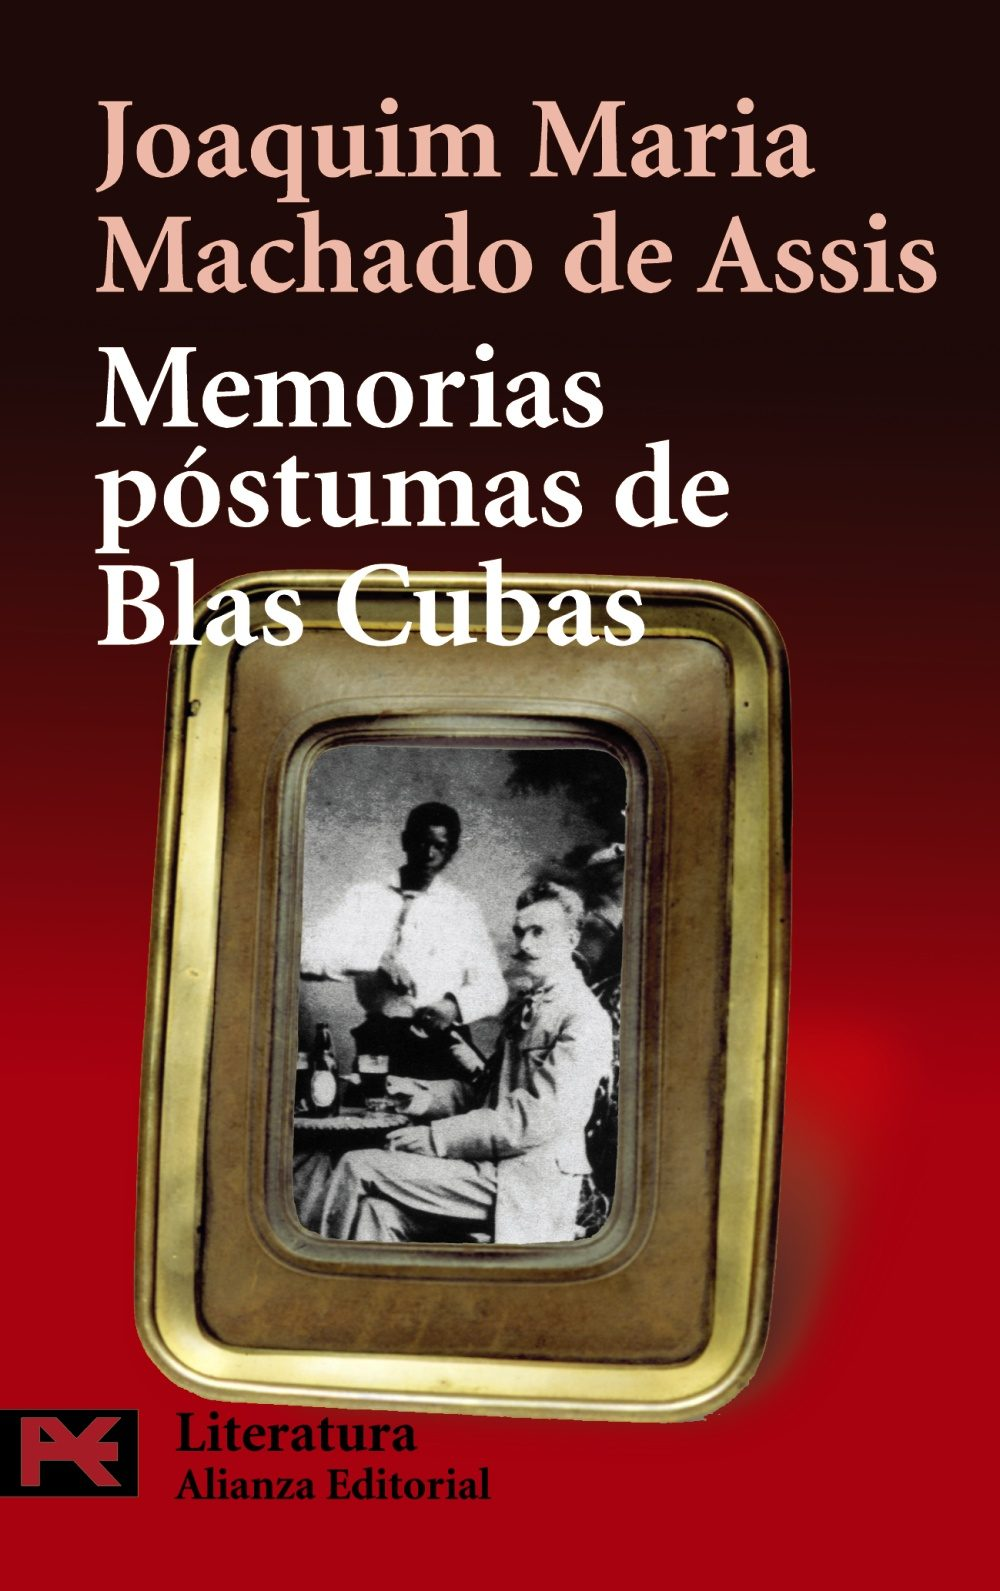 http://laantiguabiblos.blogspot.com.es/2016/11/memorias-postumas-de-blas-cubas-machado.html